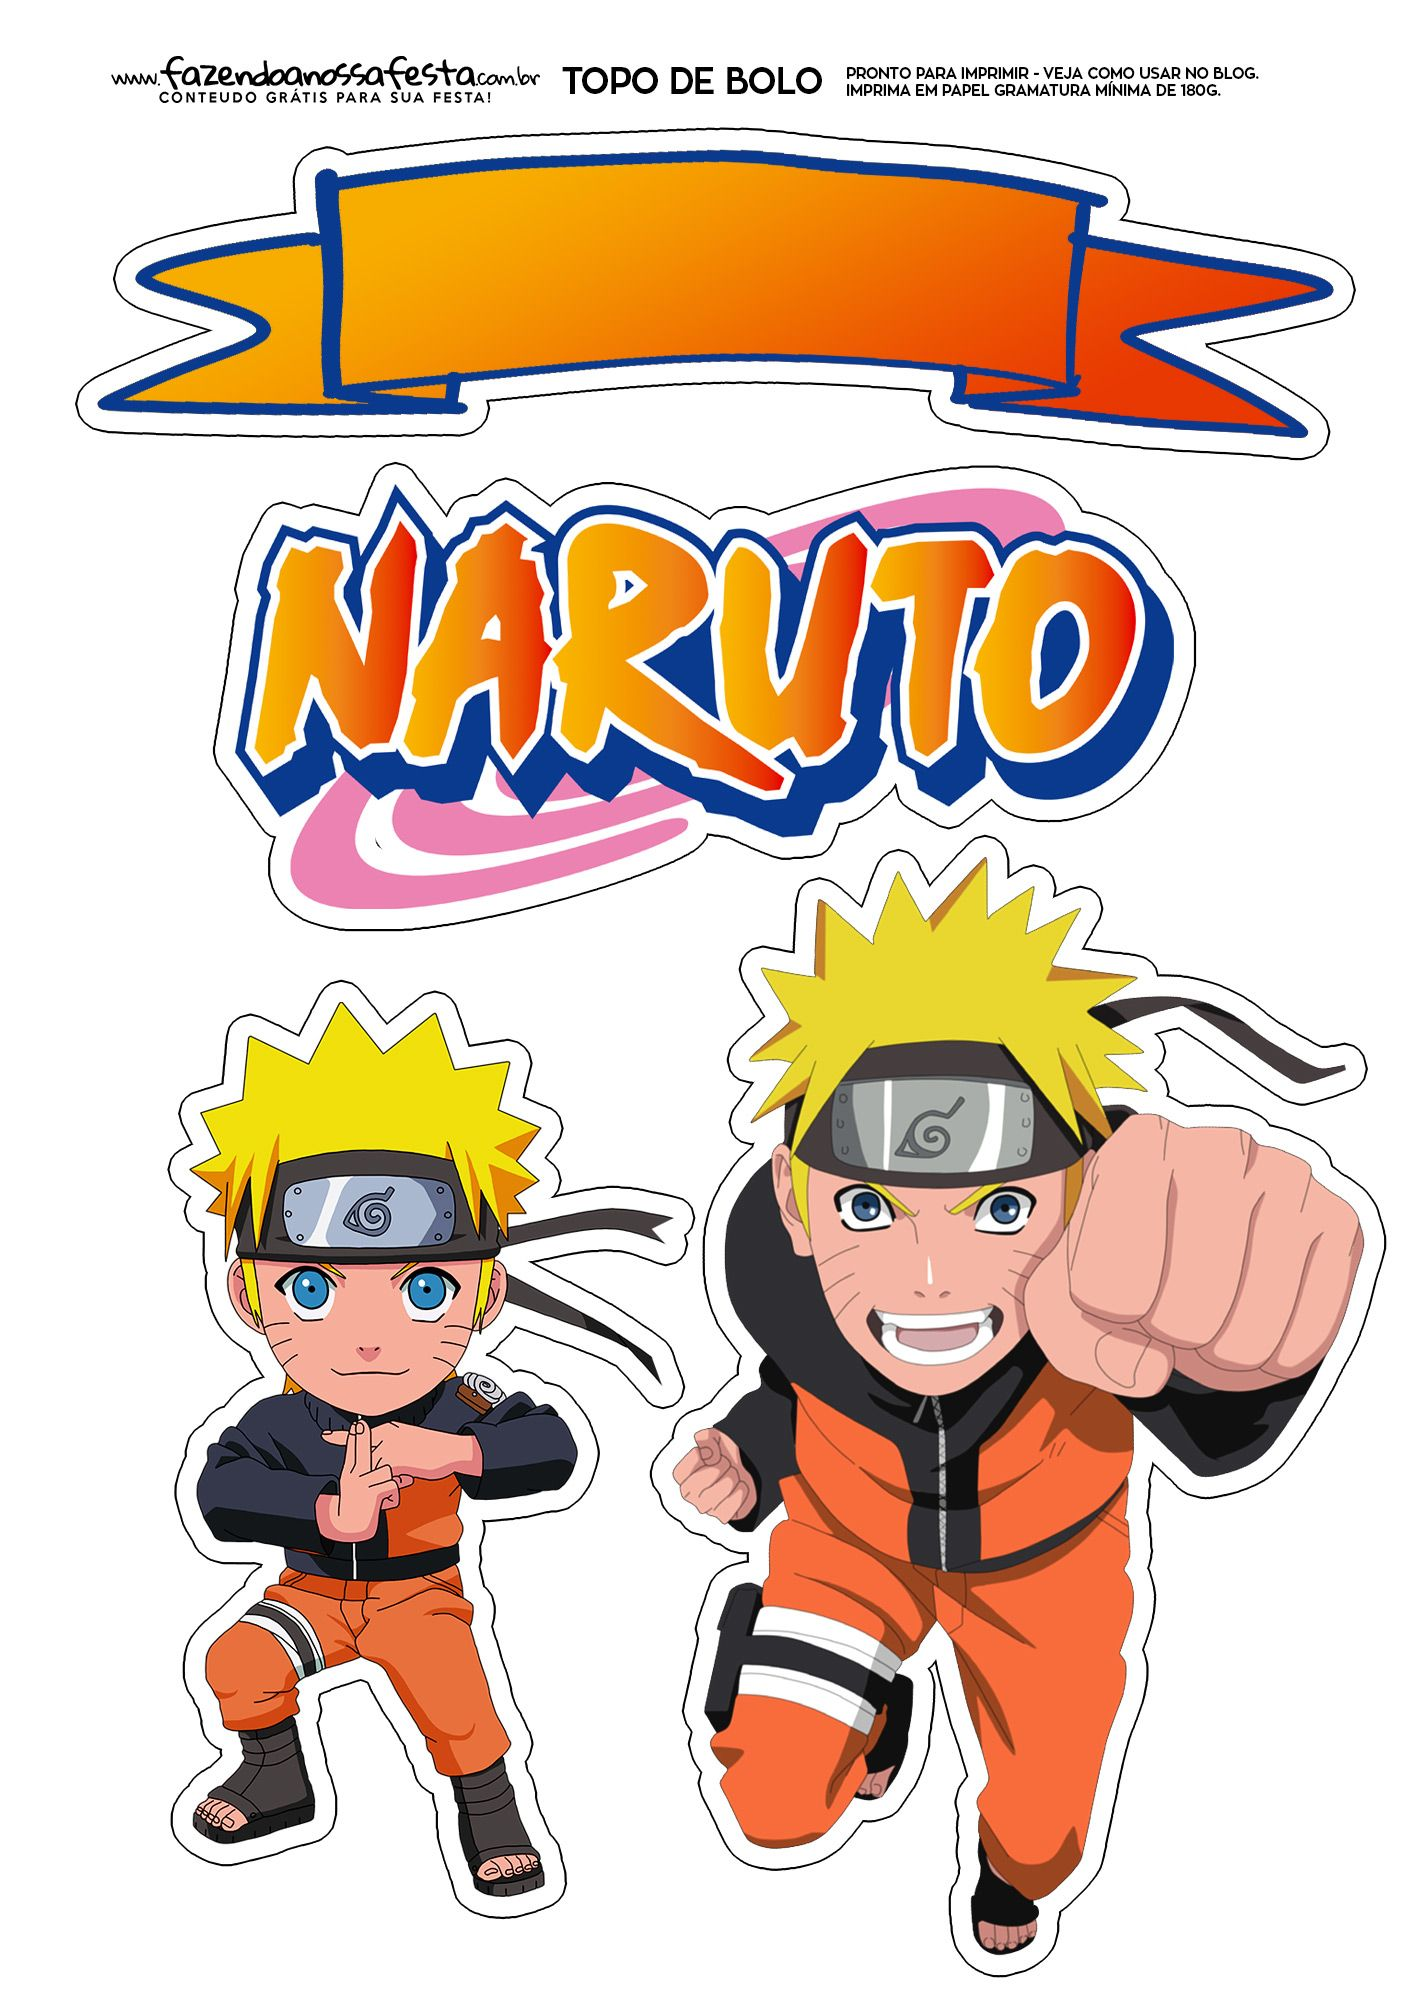 Topo De Bolo Naruto Naruto Naruto Birthday Cupcake Toppers Free